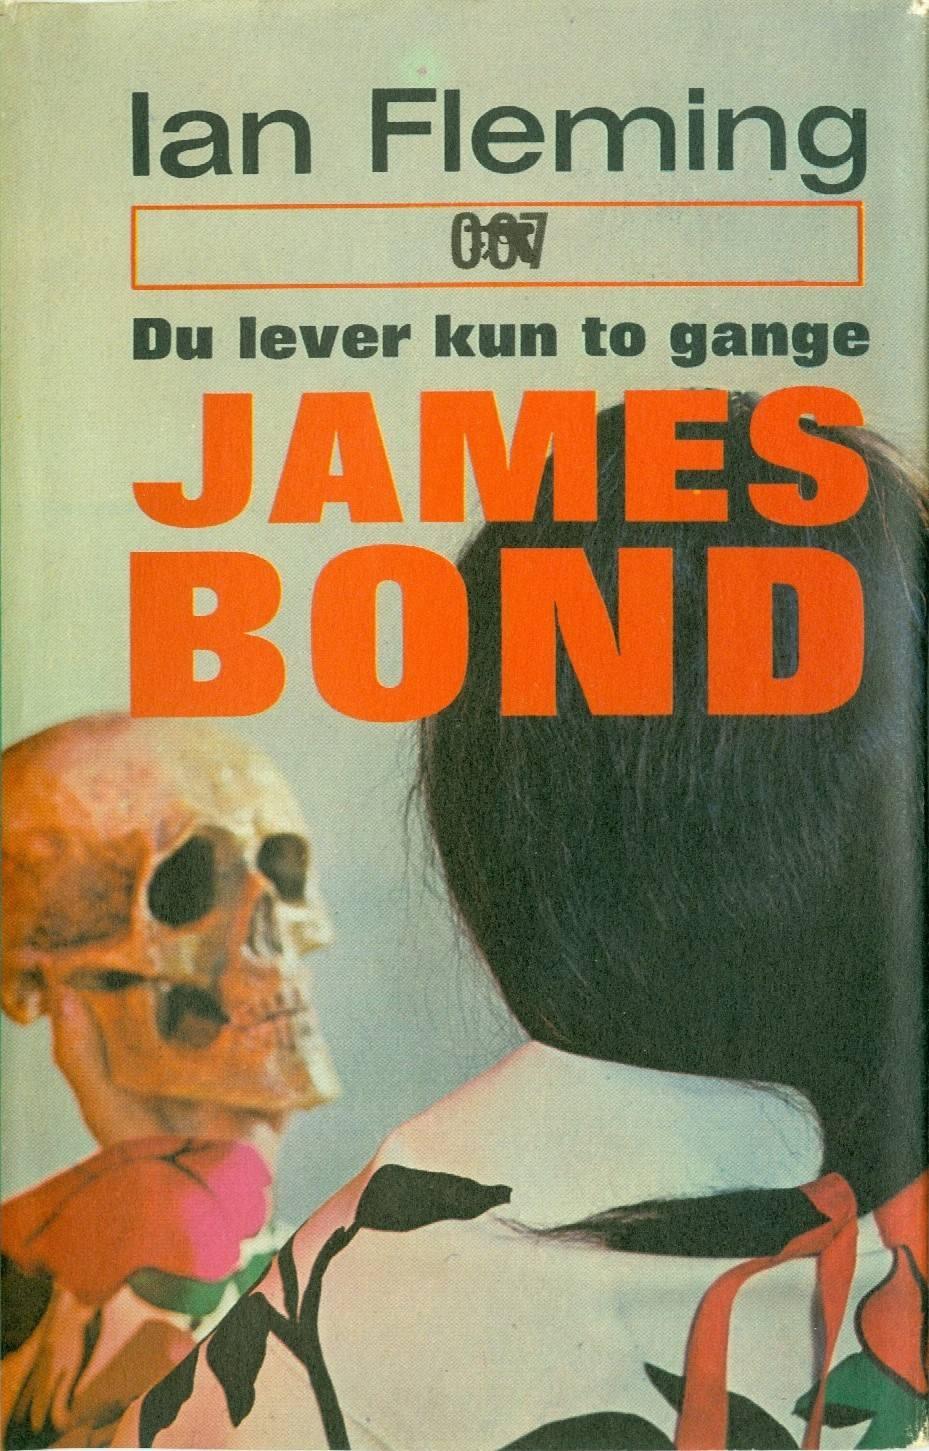 YOLT 1965 hardcover forside